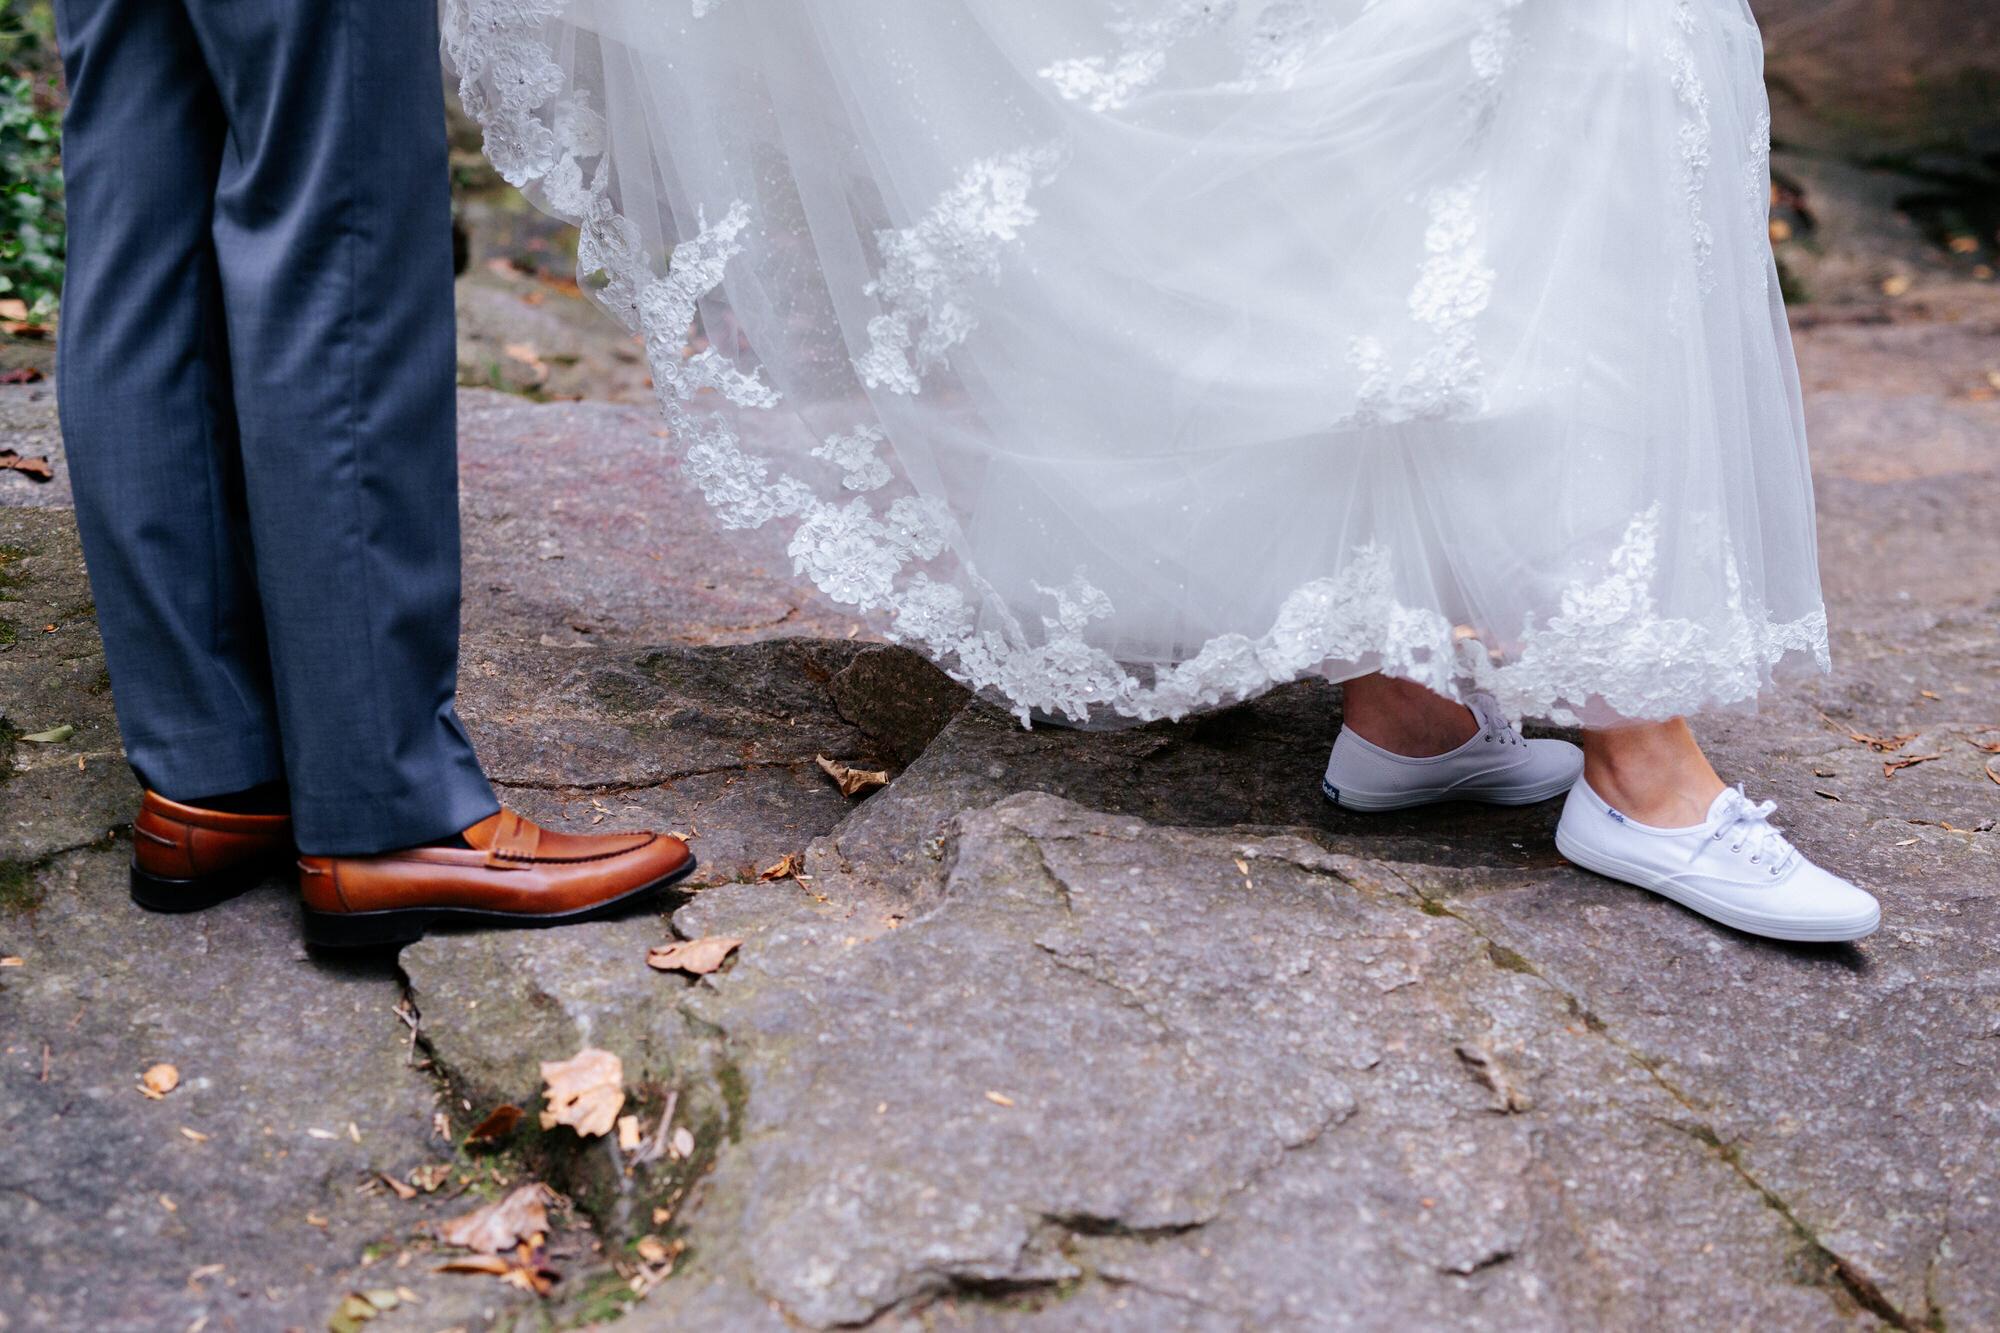 twigs-tempietto-wedding-greenville-downtown-289.JPG